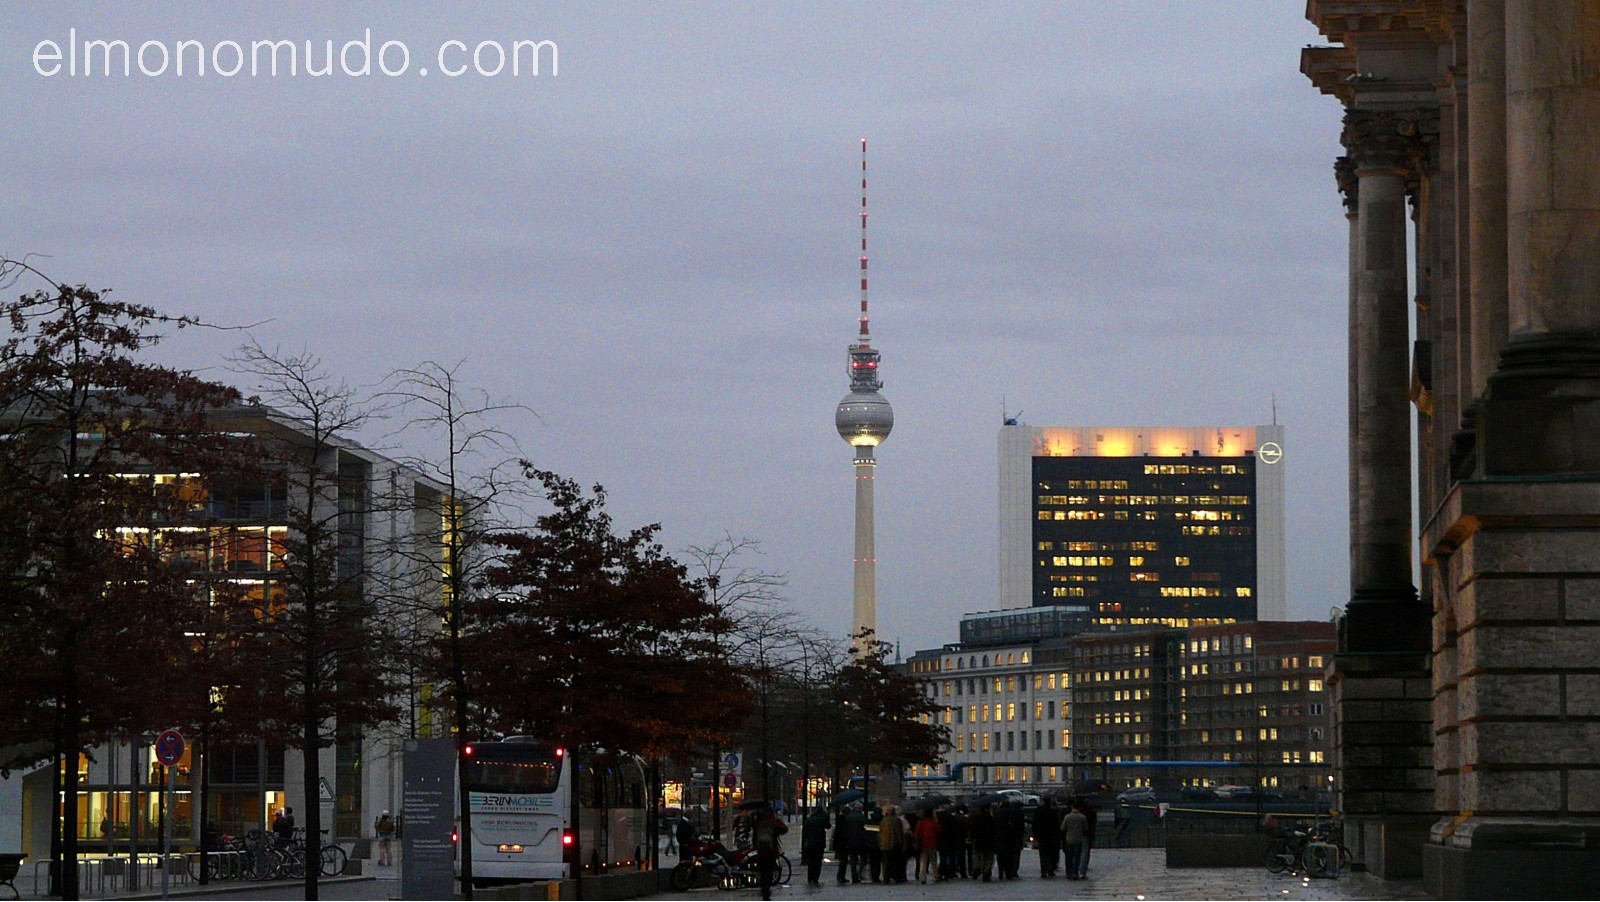 fernsehturm. torre de television vista desde todo berlin